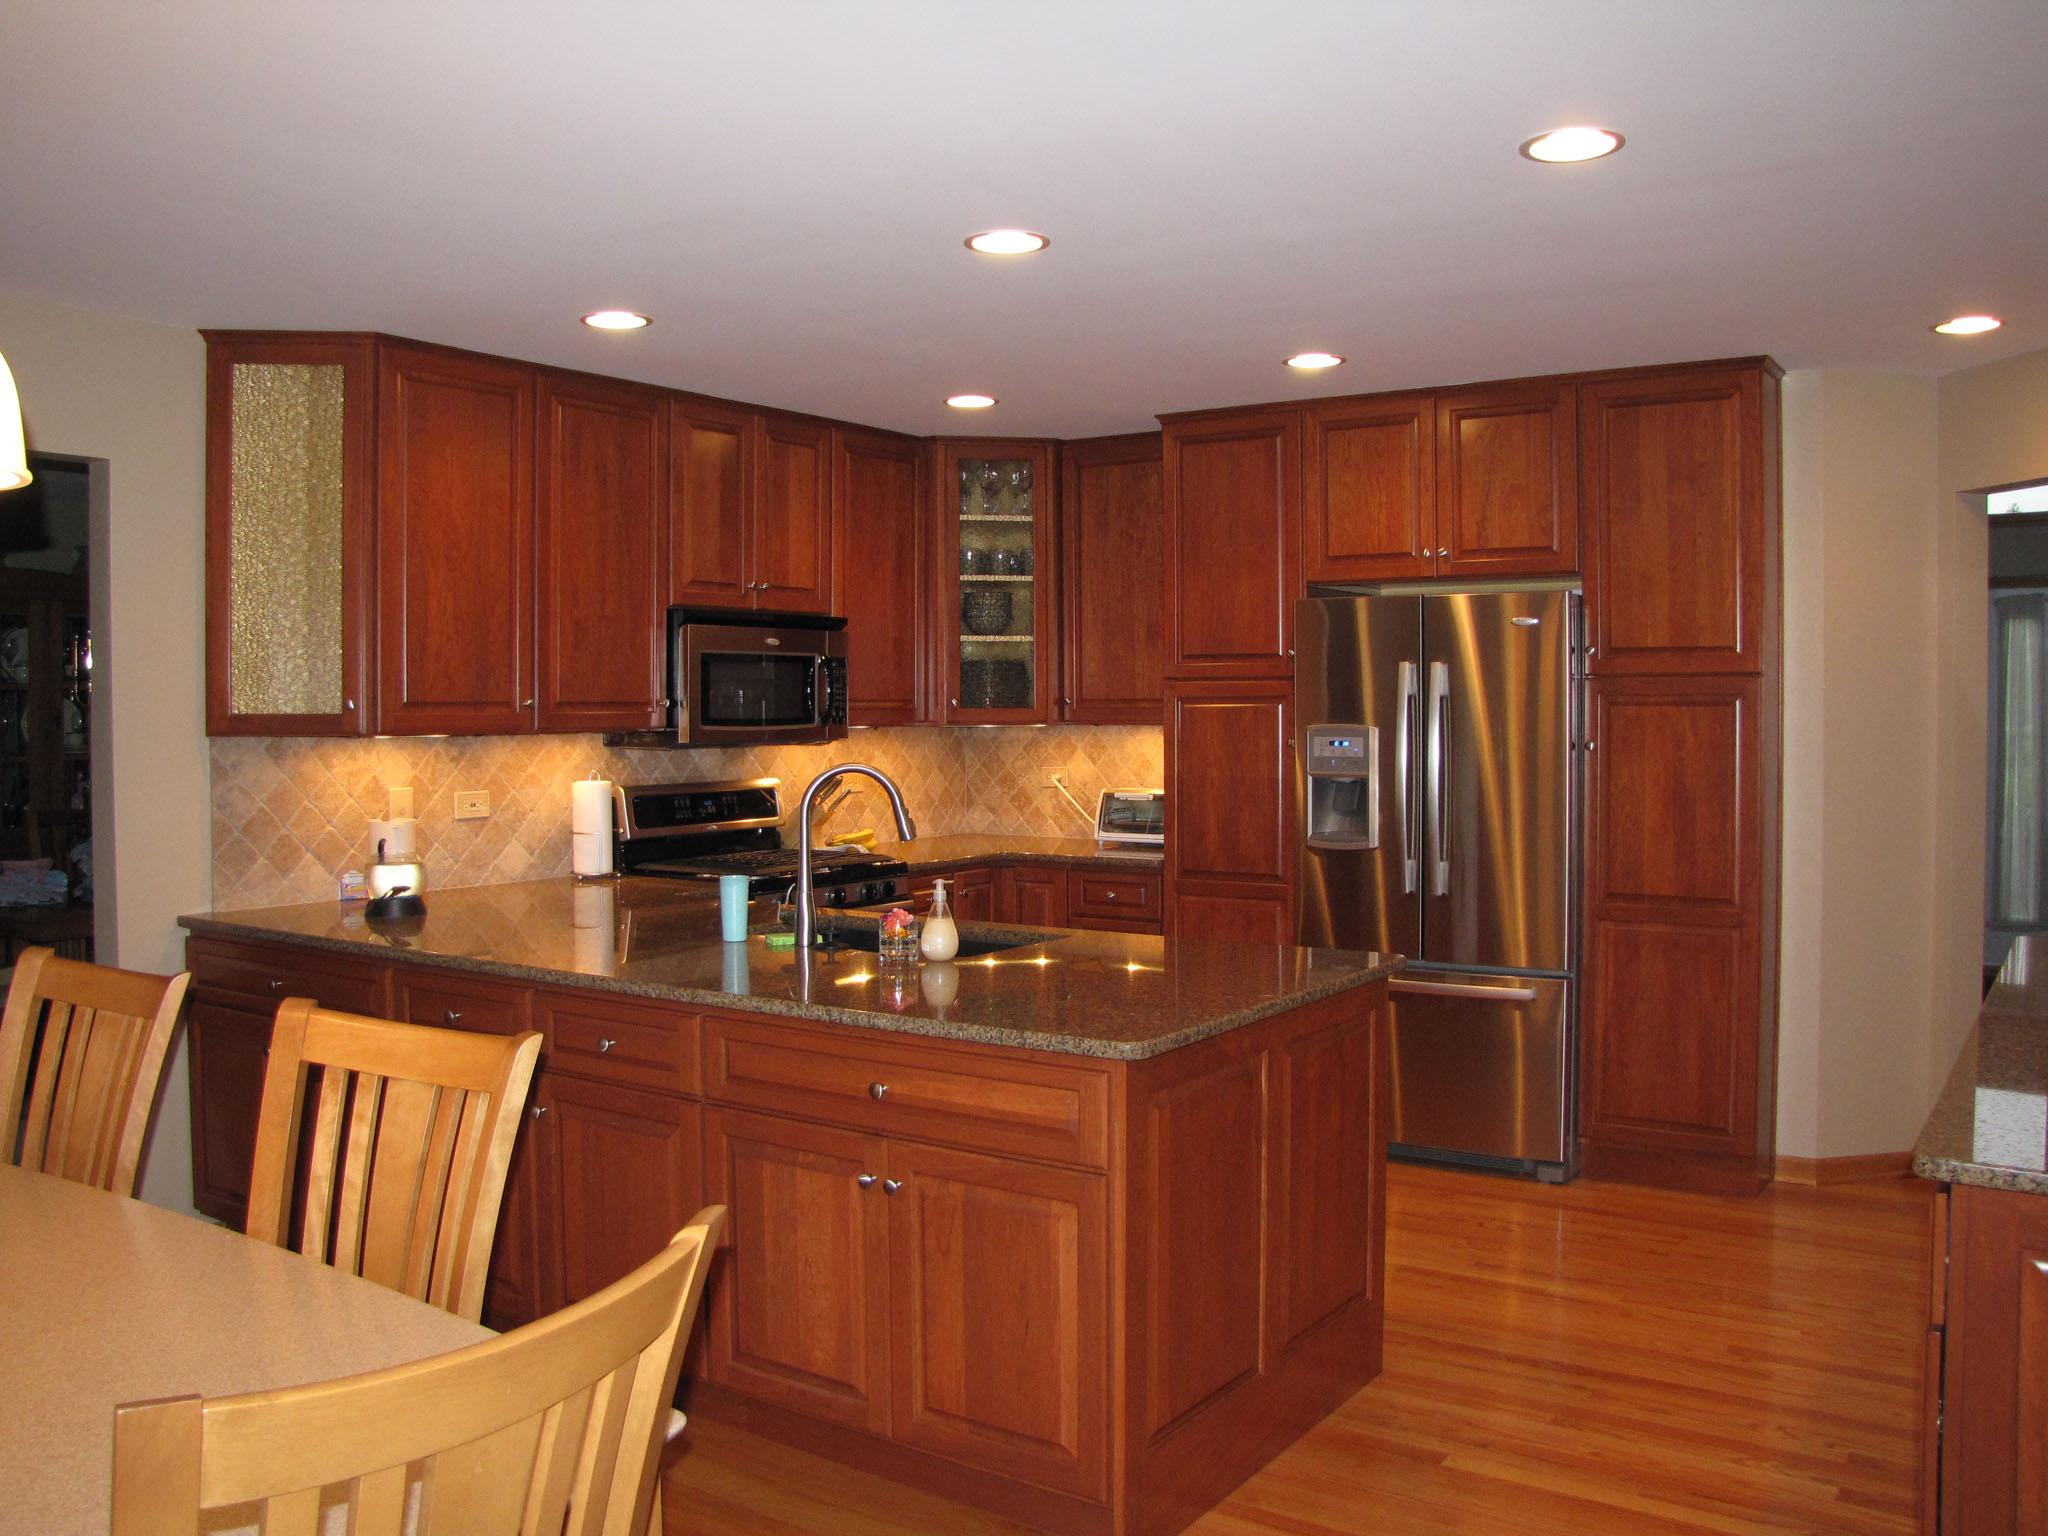 Renovation Ideas Small Kitchens